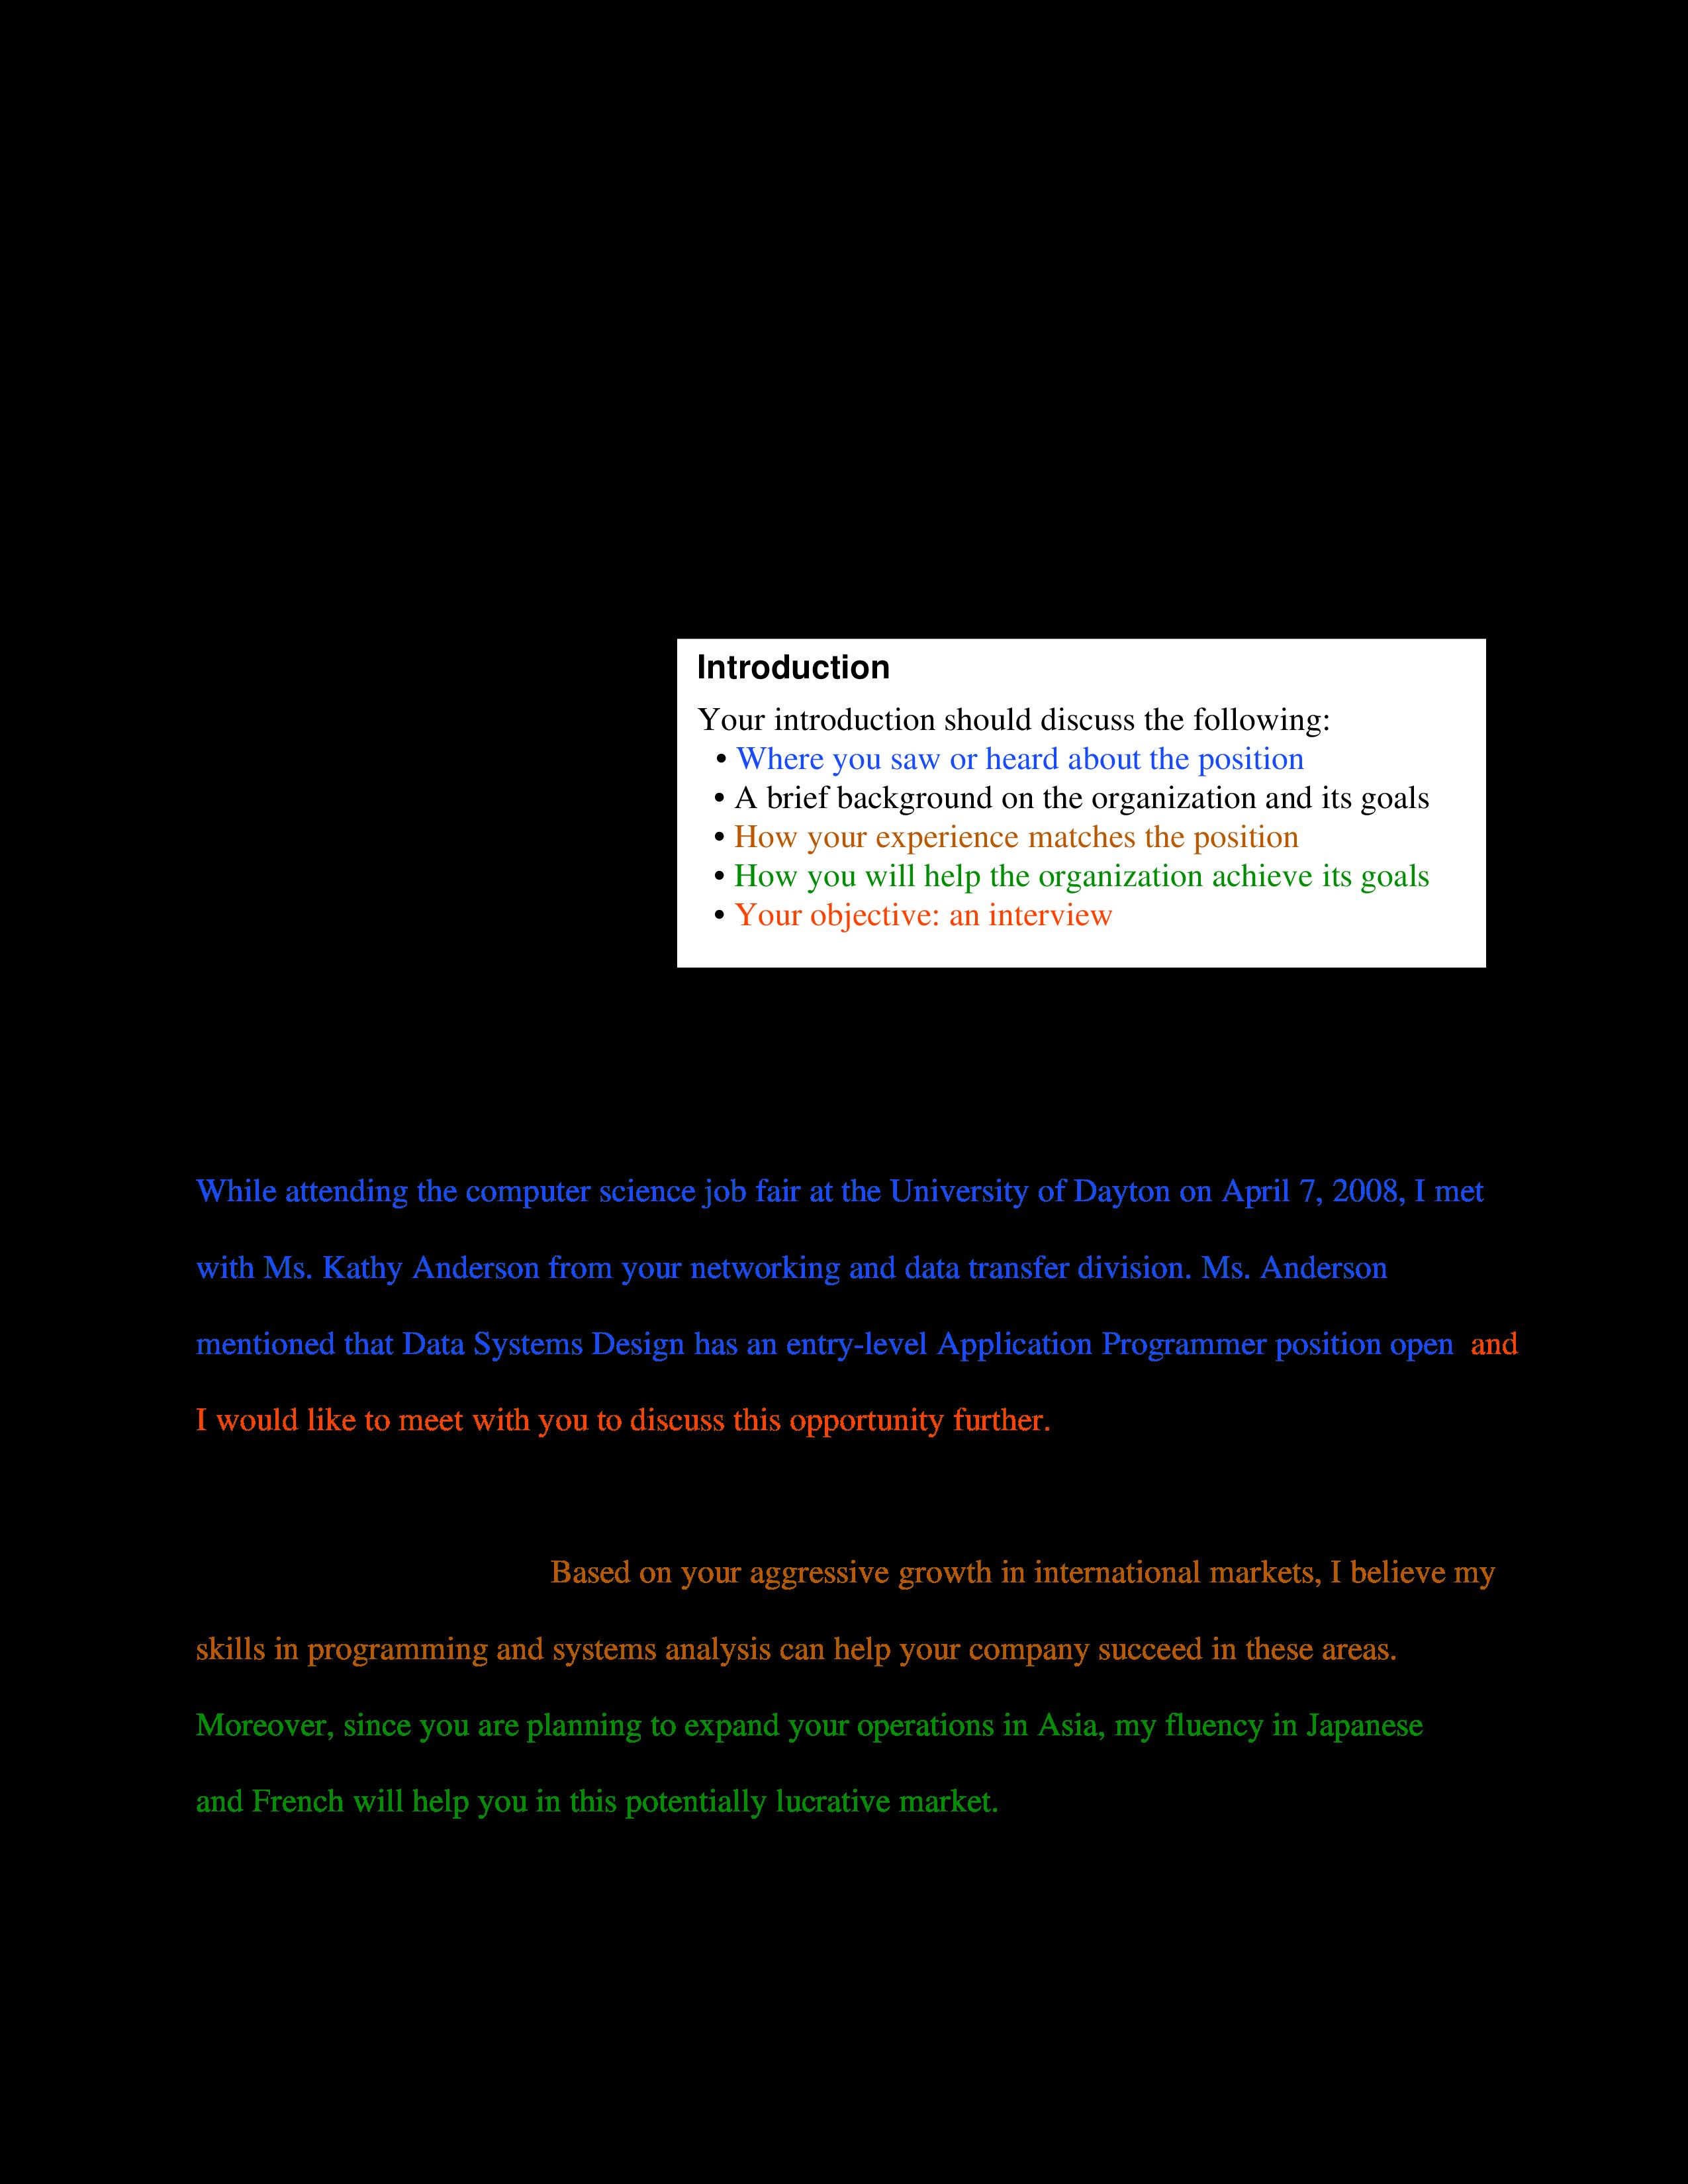 formal job application email  templates at